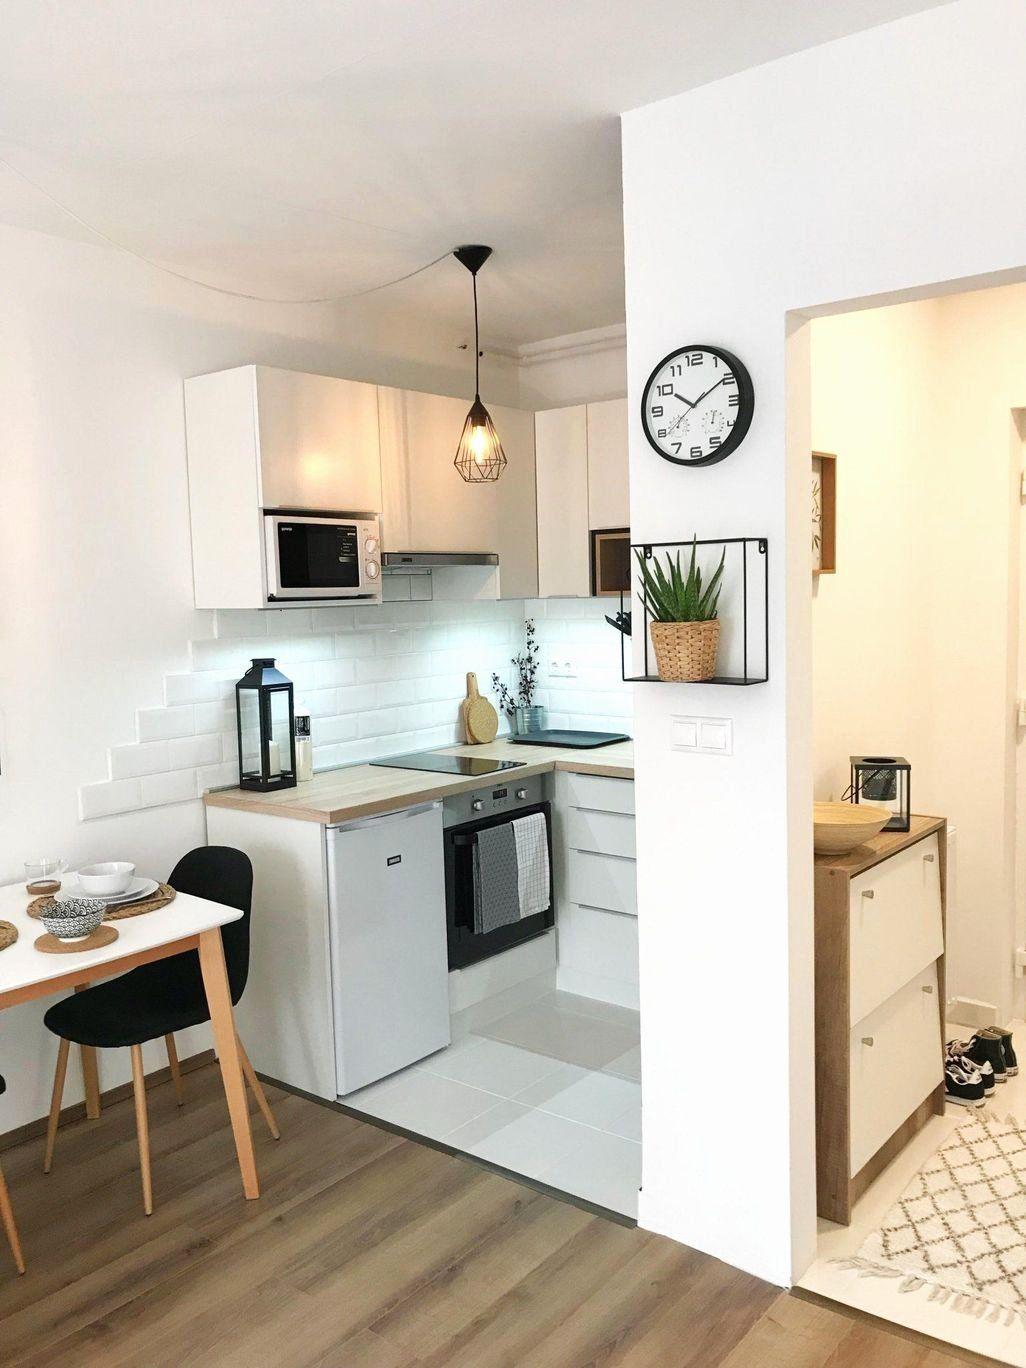 Studio Apartment Kitchen Ideas Best Of Nice 40 Cozy Small Apartment Kitchen Design I Small Kitchen Design Apartment Small Kitchen Decor Small Apartment Kitchen